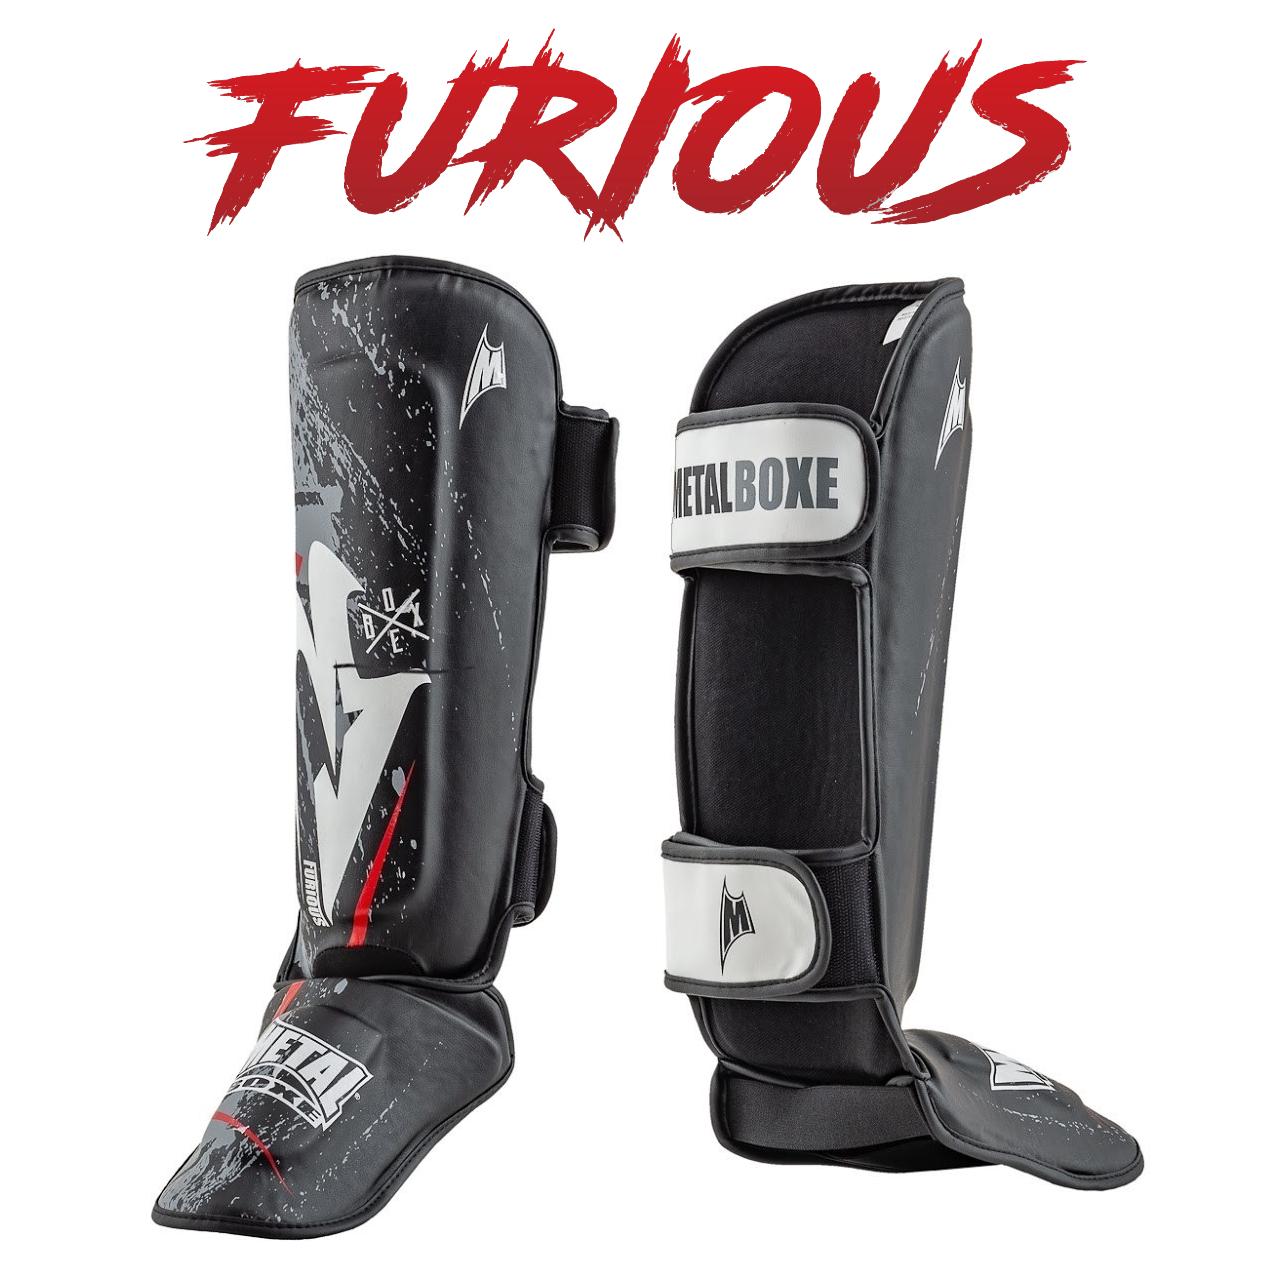 Protège tibias Furious Métal boxe